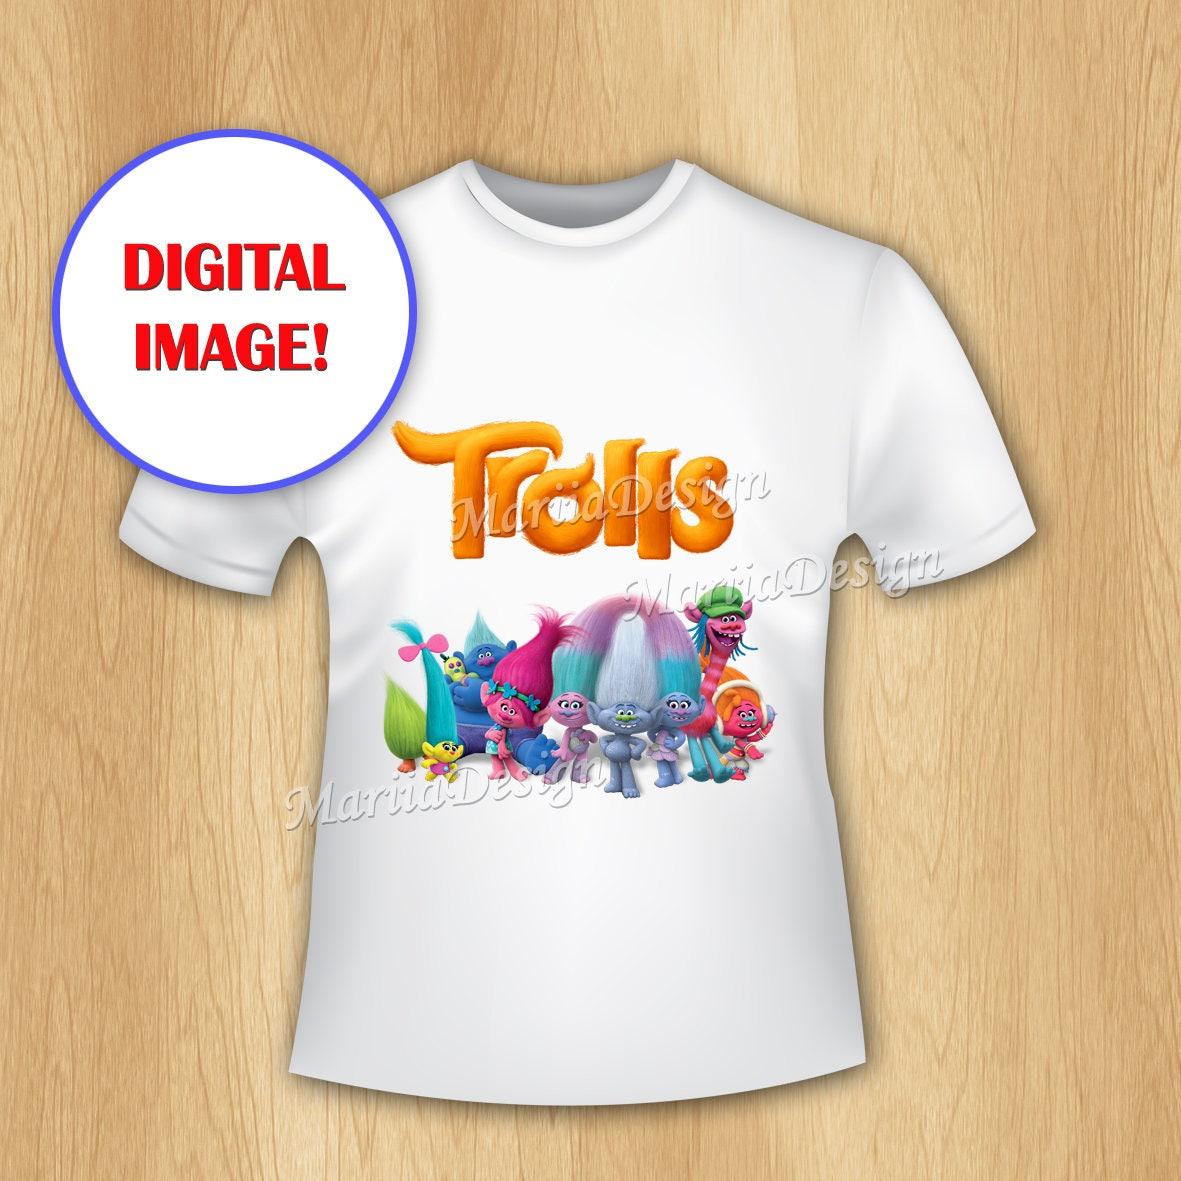 Trolls Iron On Transfer Trolls T-shirt Transfer Trolls   Etsy